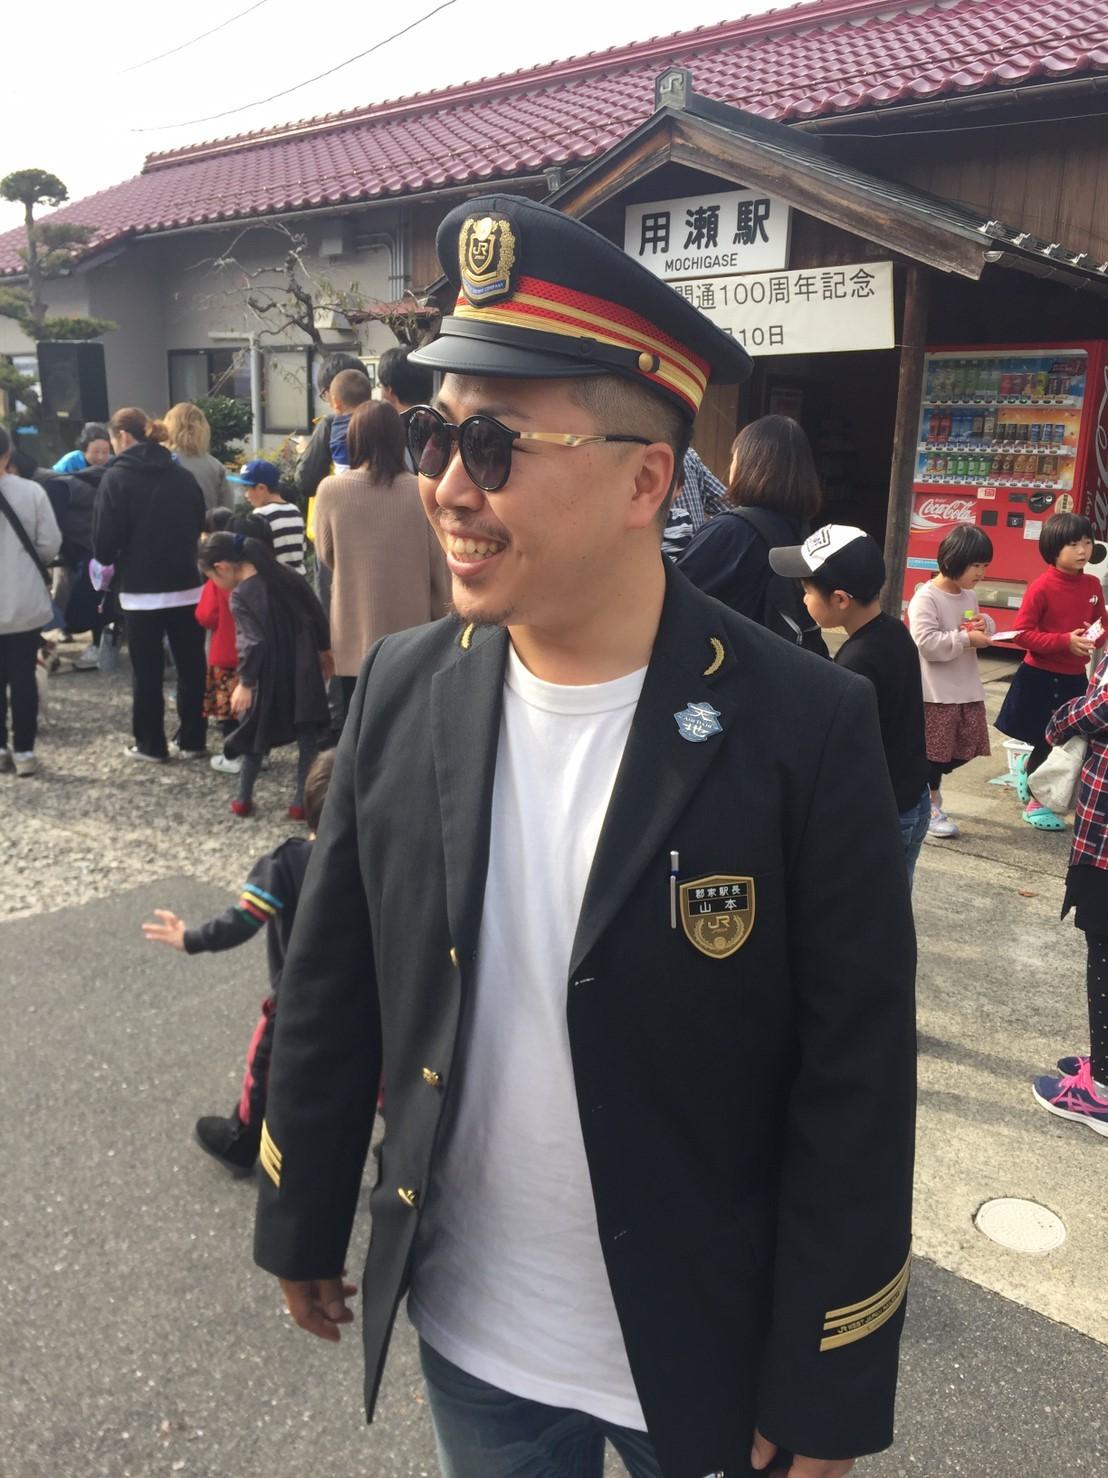 用瀬駅開通100周年記念式典LIVE 2019 レポ_e0115904_17101485.jpg